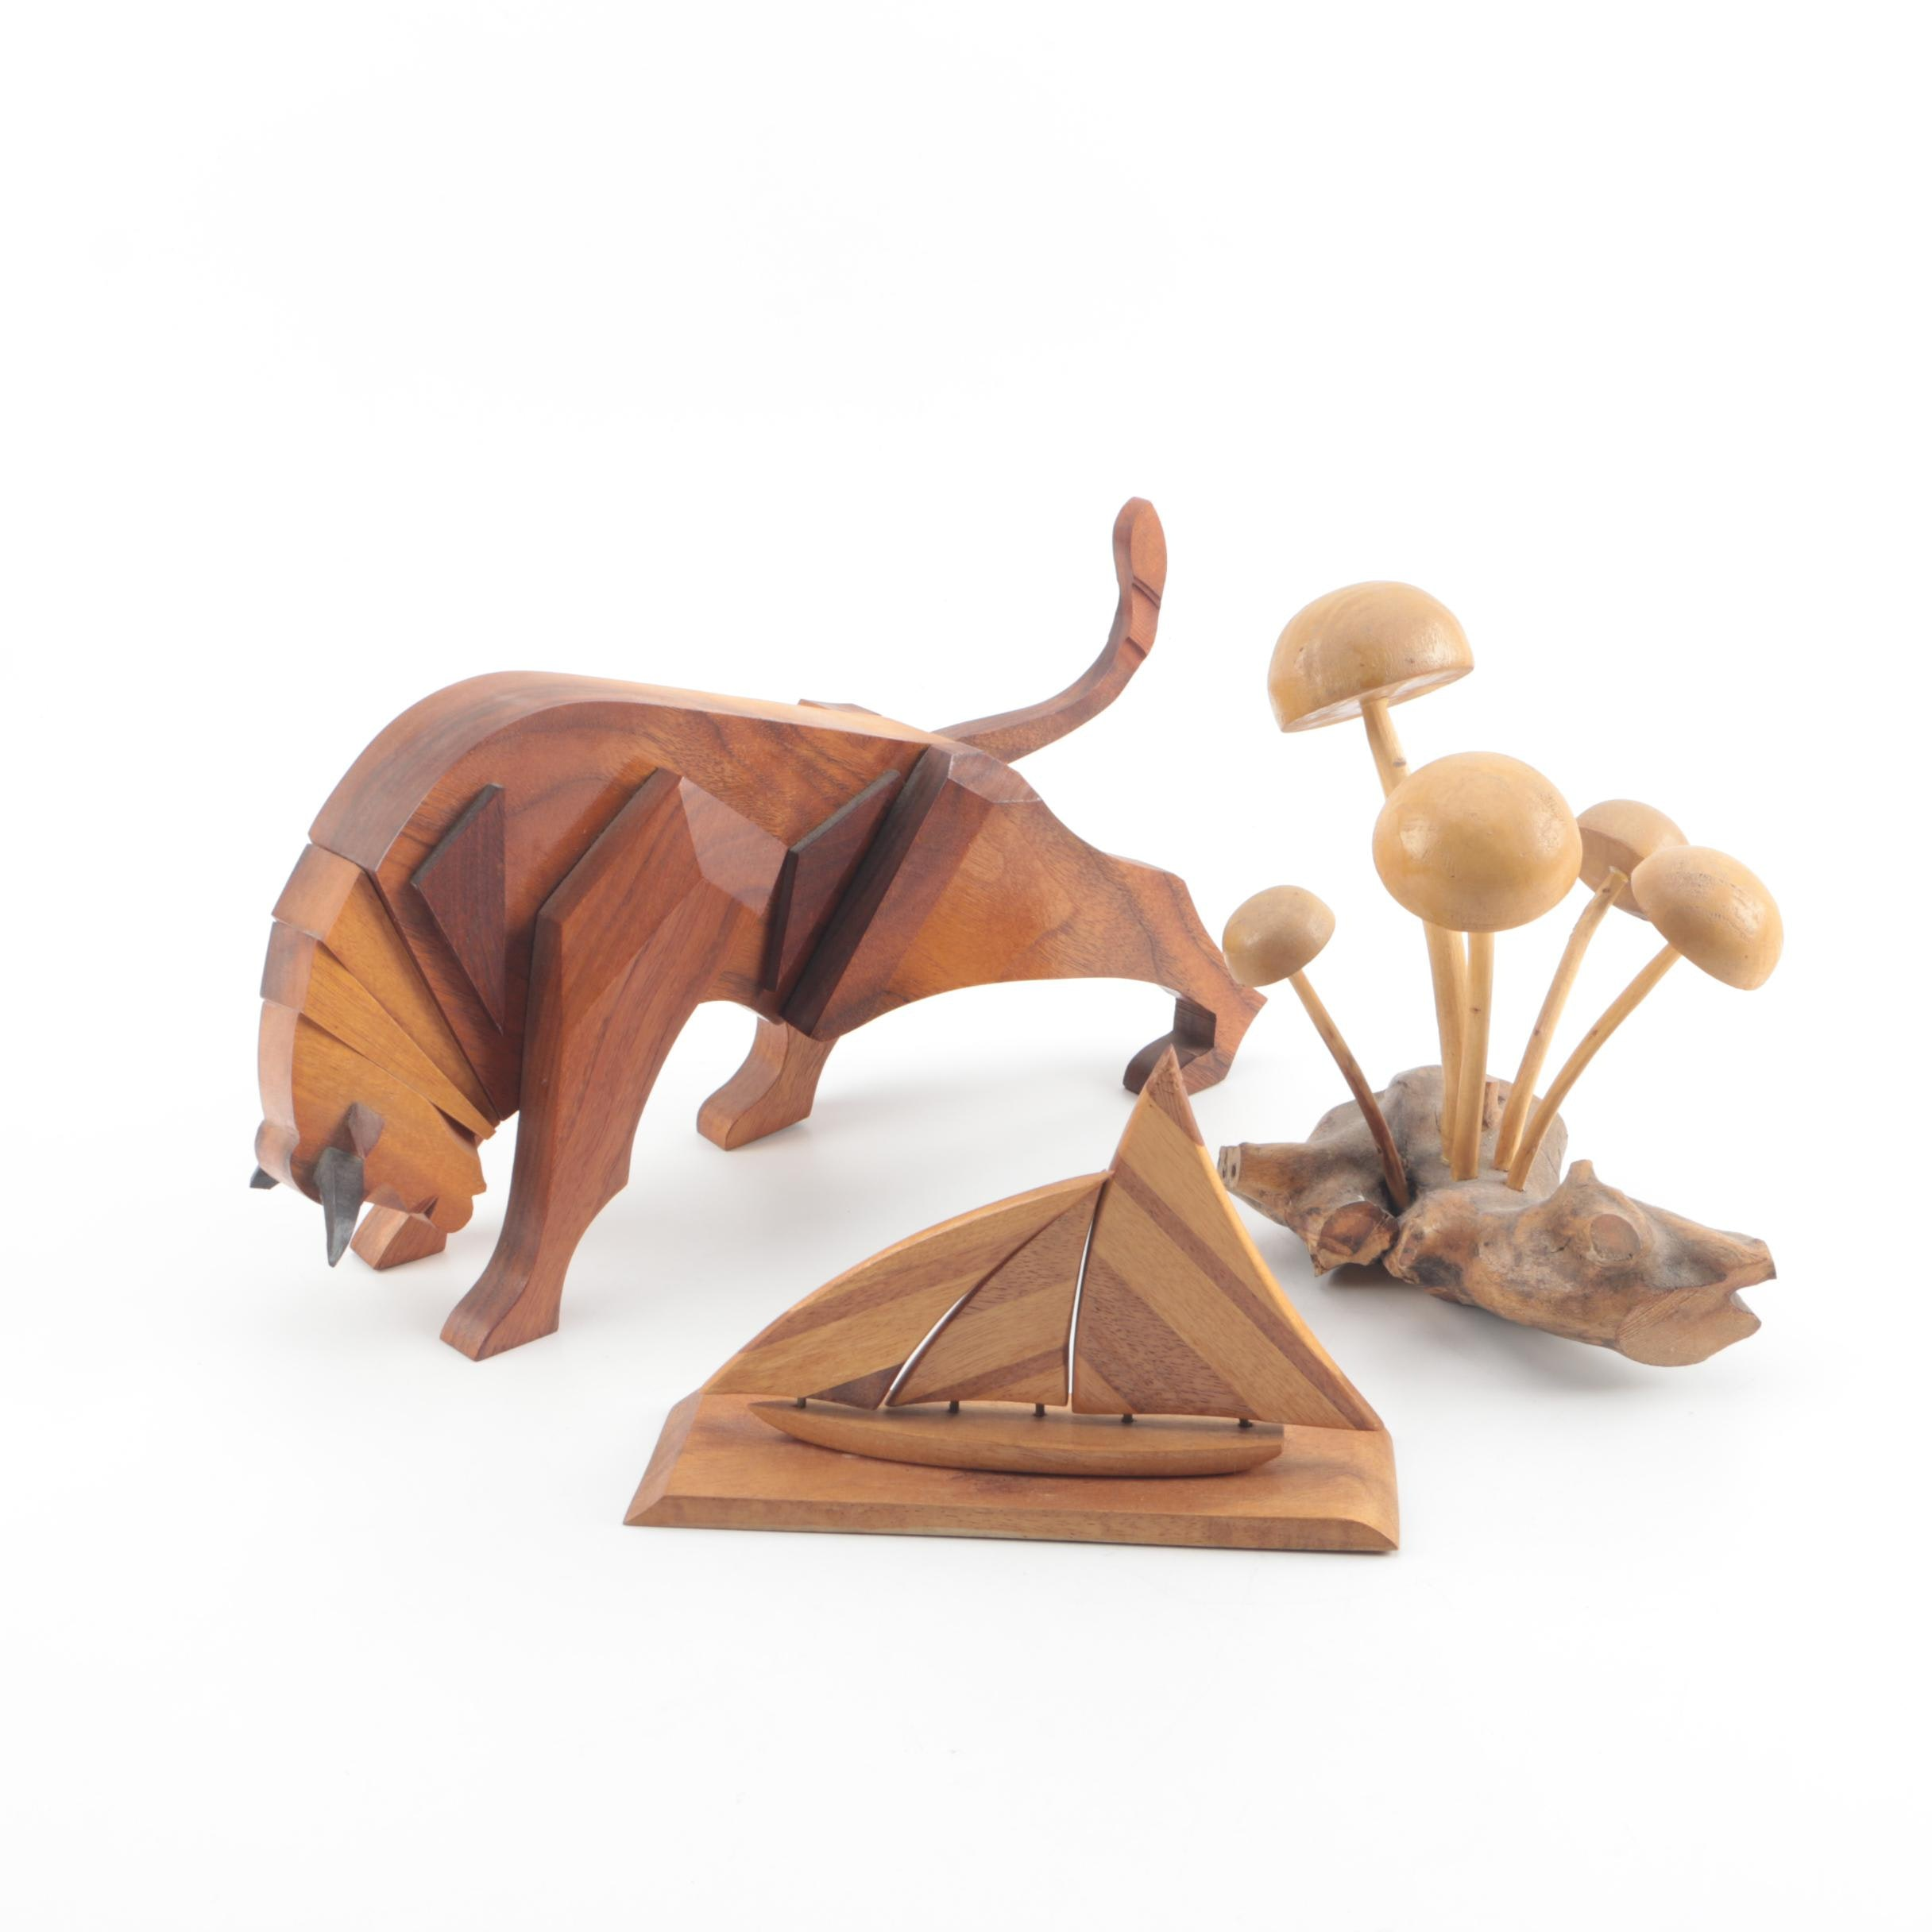 Wooden Sculptures including a Schooner, Mushrooms, and a Bull